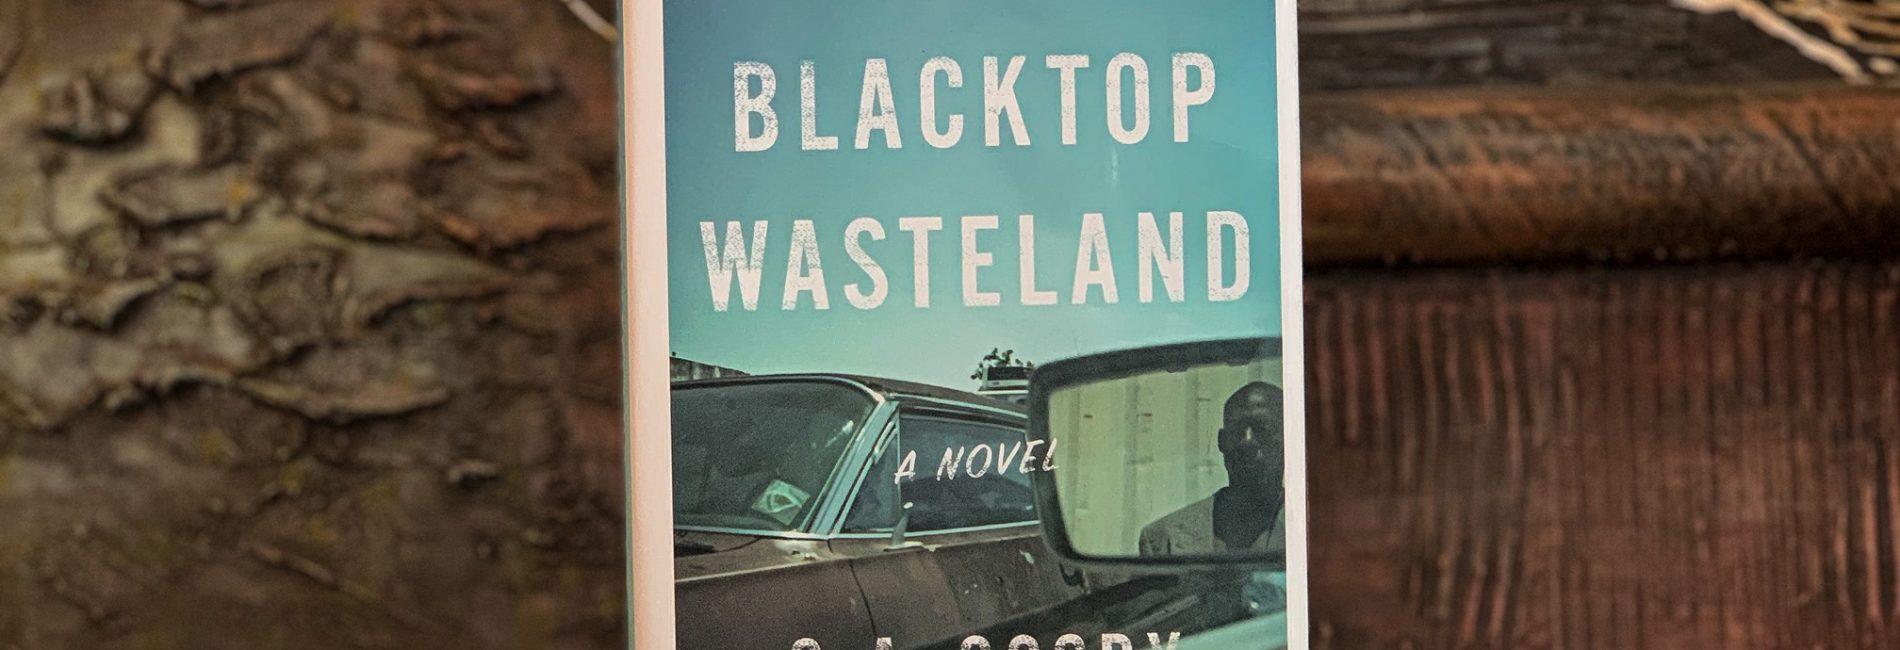 THE ZEG BOOKCLUB: BLACKTOP WASTELAND